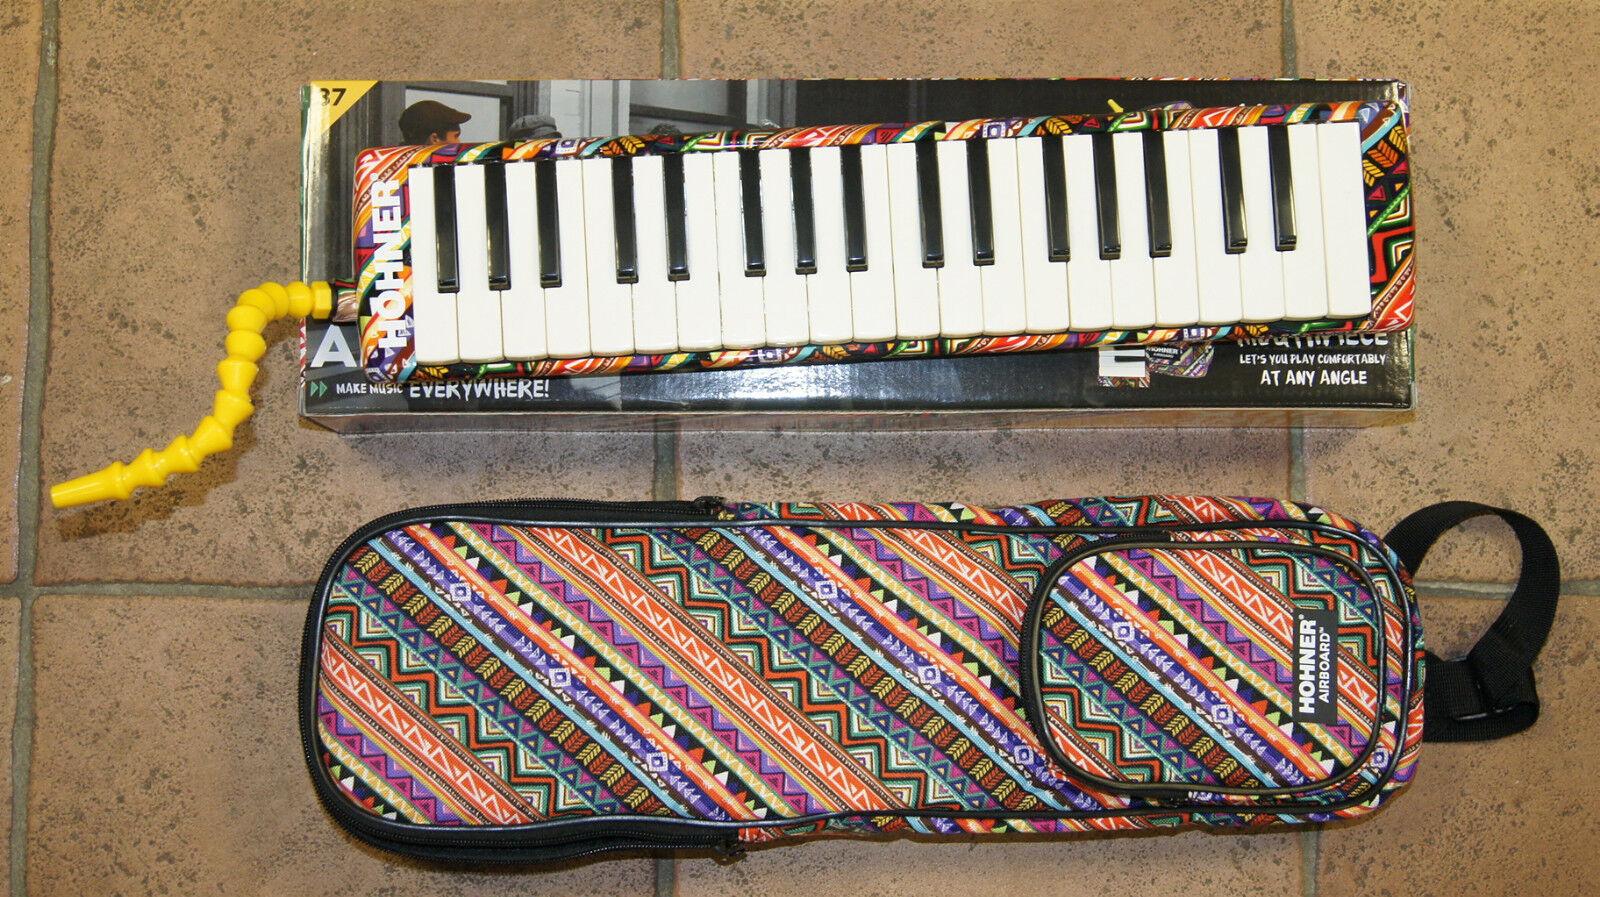 Melodica Melodica Melodica Piano Hohner Airboard llaves 32 o 37 Notas Instrumento Nuevo Con Estuche d69e94